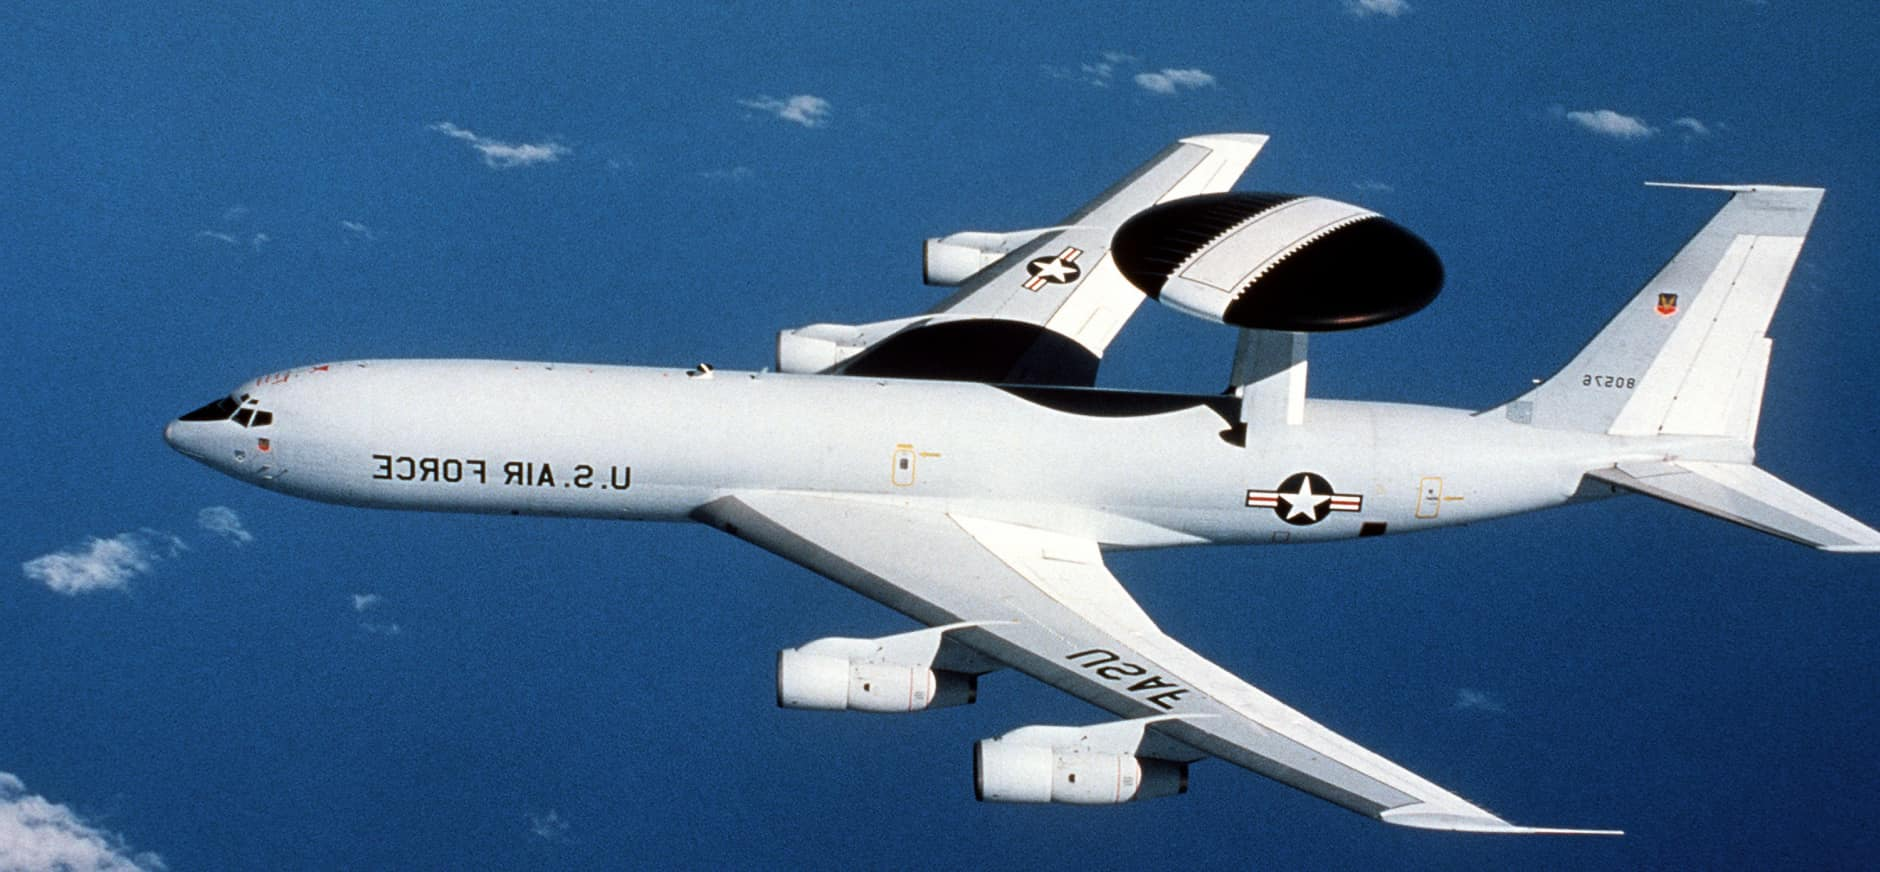 Standpunt Natuurmonumenten over bosbeheerplan AWACS vliegbasis